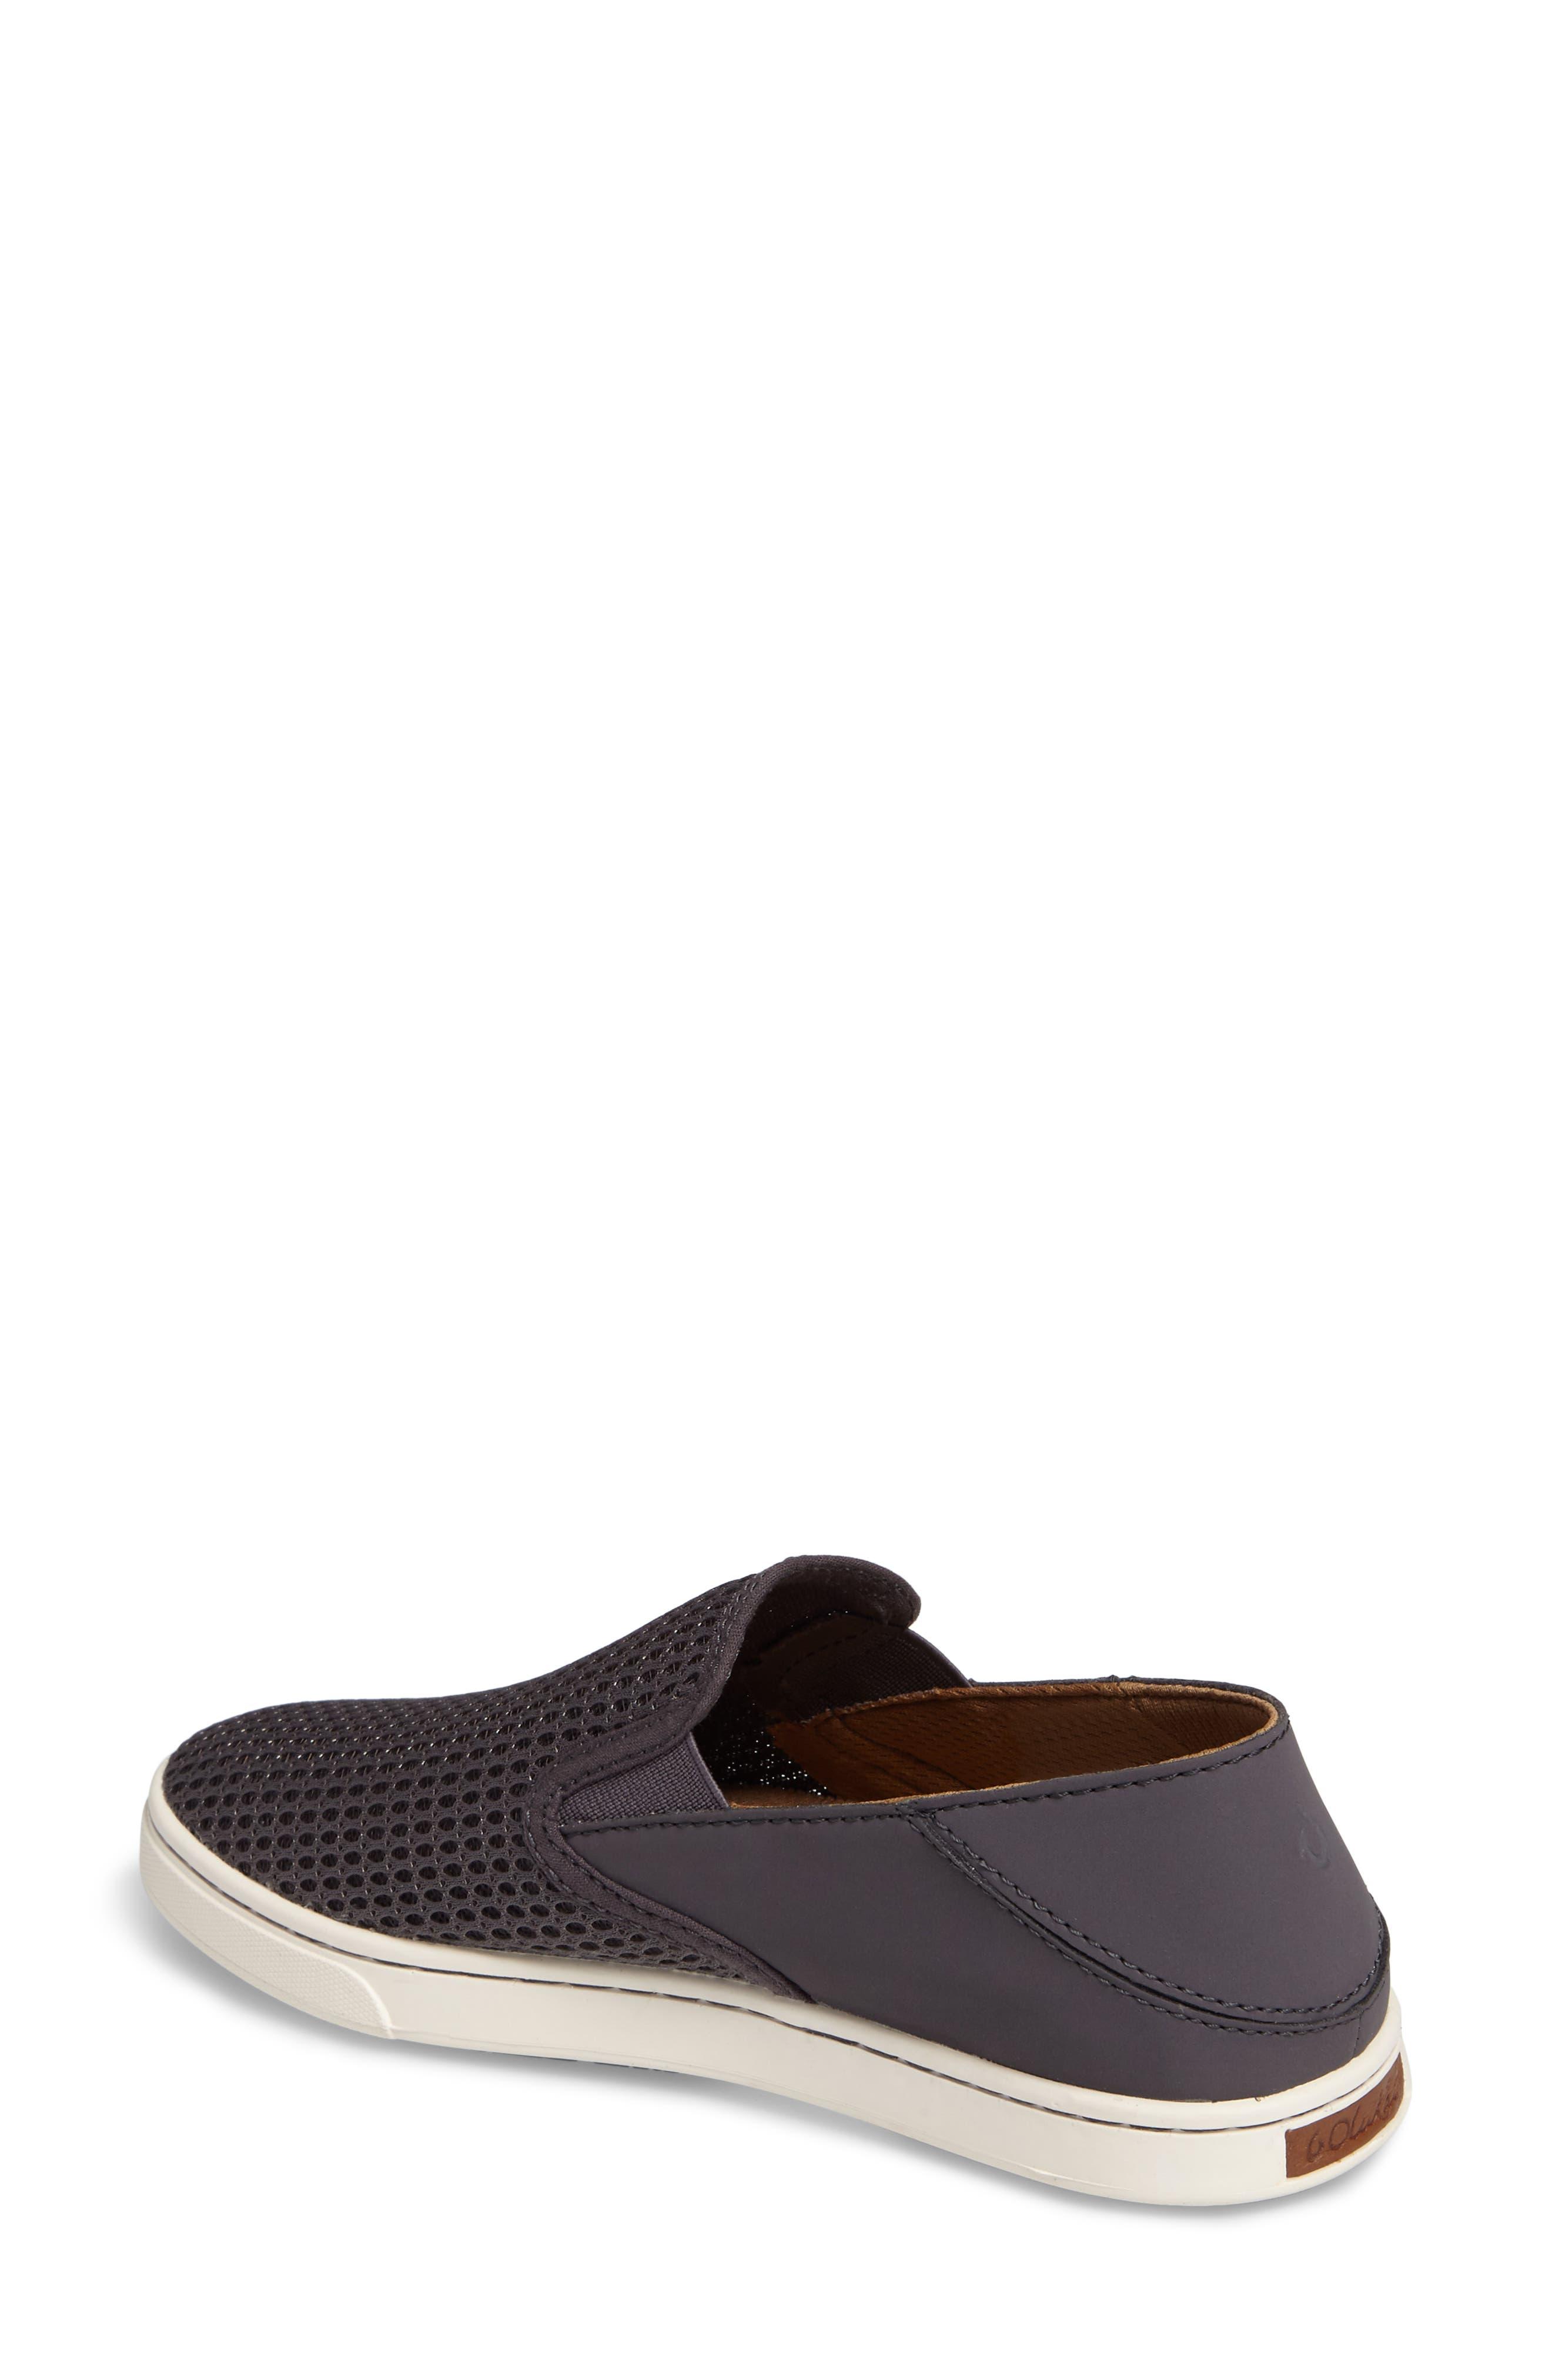 'Pehuea' Slip-On Sneaker,                             Alternate thumbnail 2, color,                             PAVEMENT/ PAVEMENT FABRIC